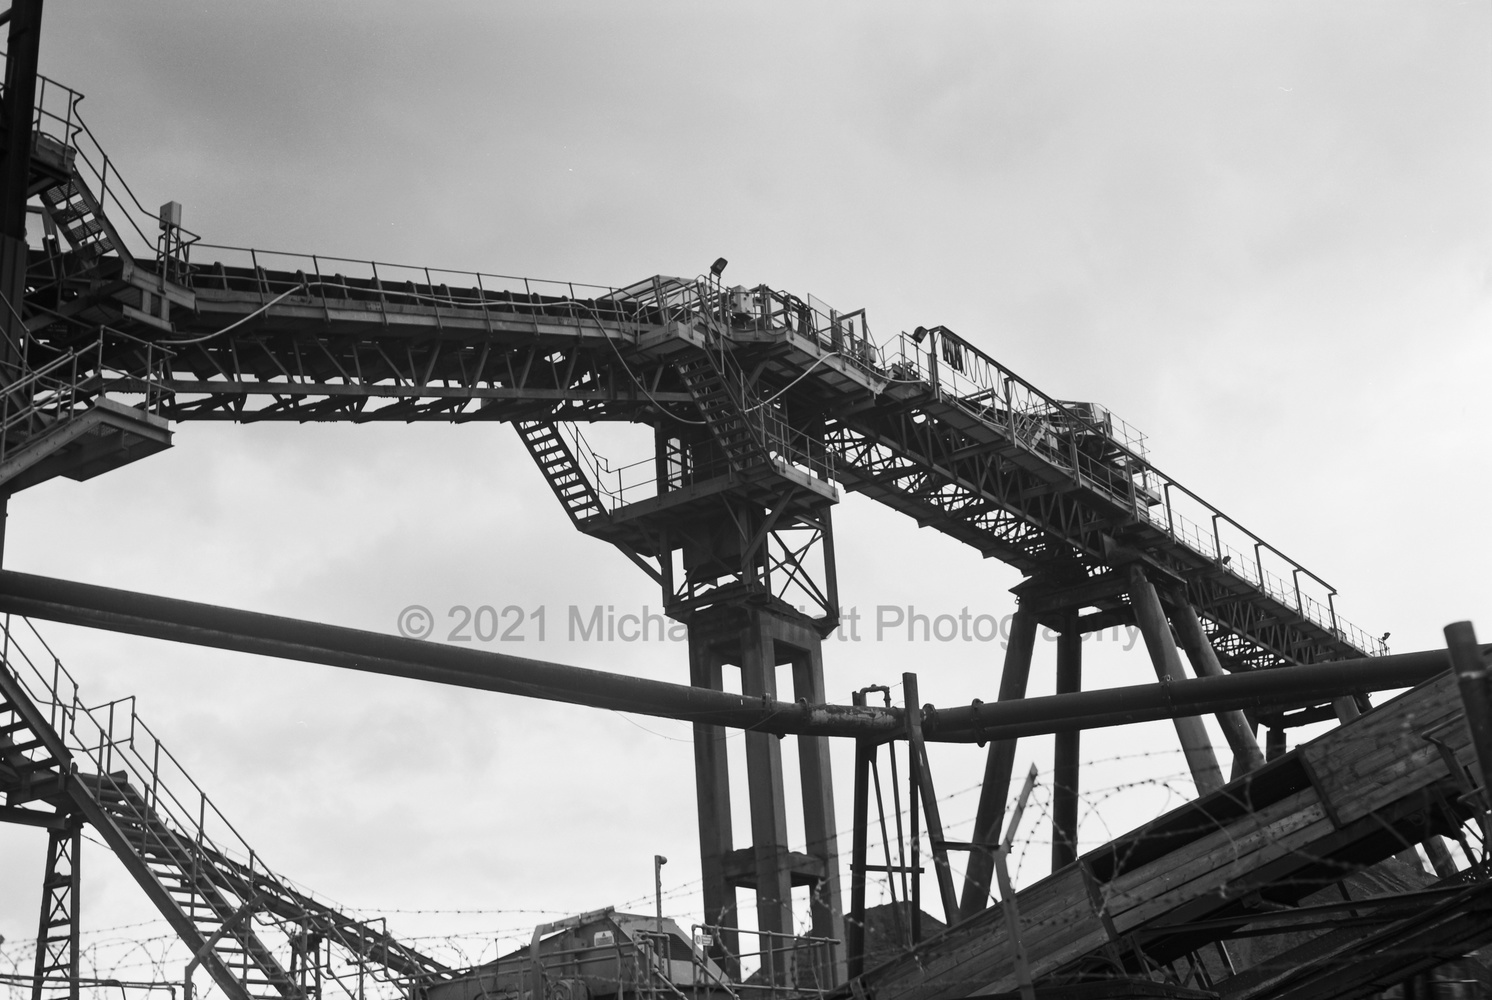 Angerstein Wharf conveyor by Michael Elliott